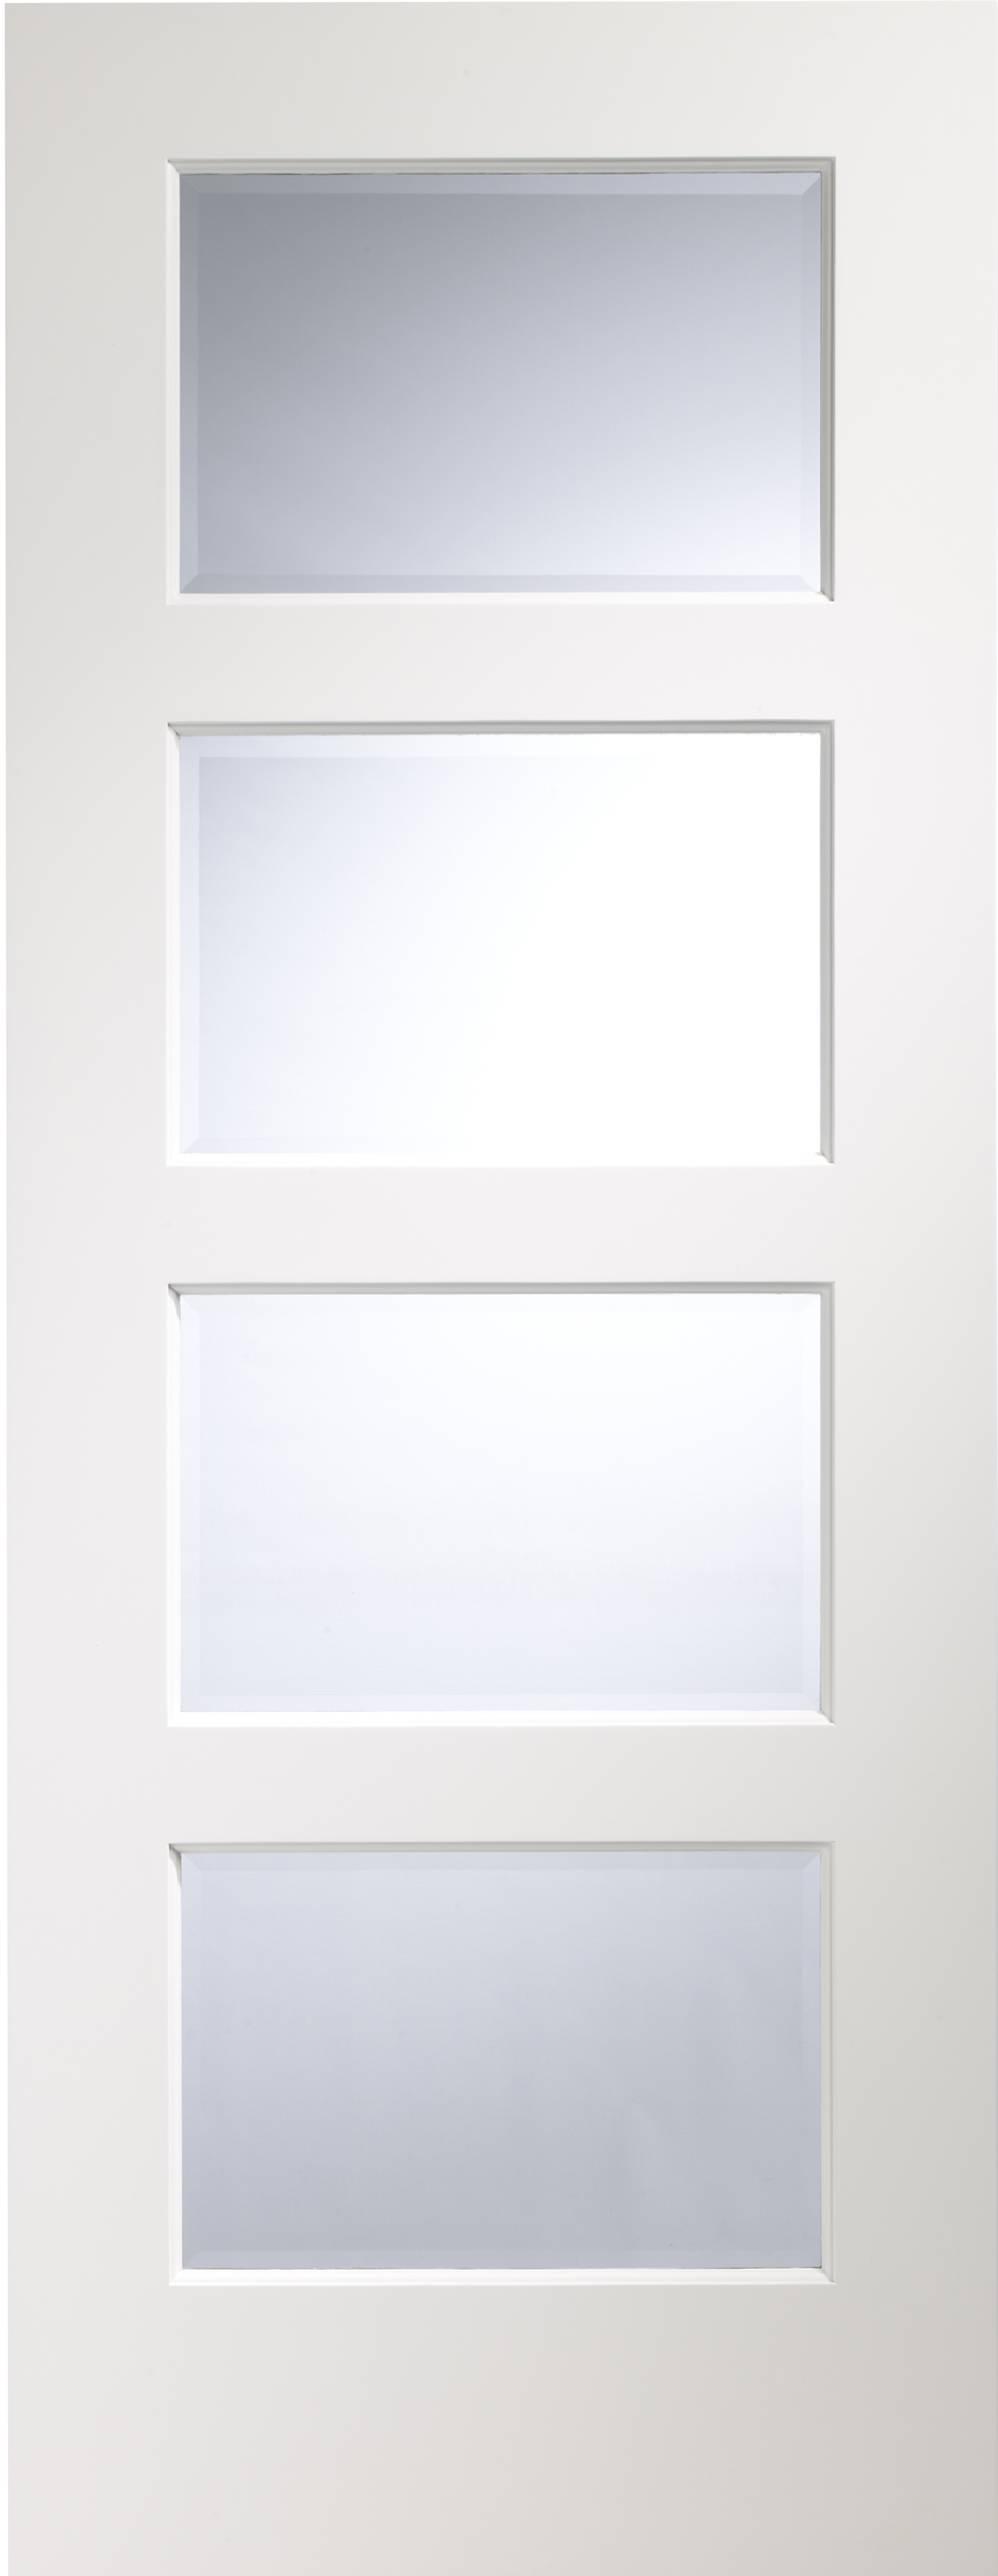 Severo White Glazed Door - PREFINISHED